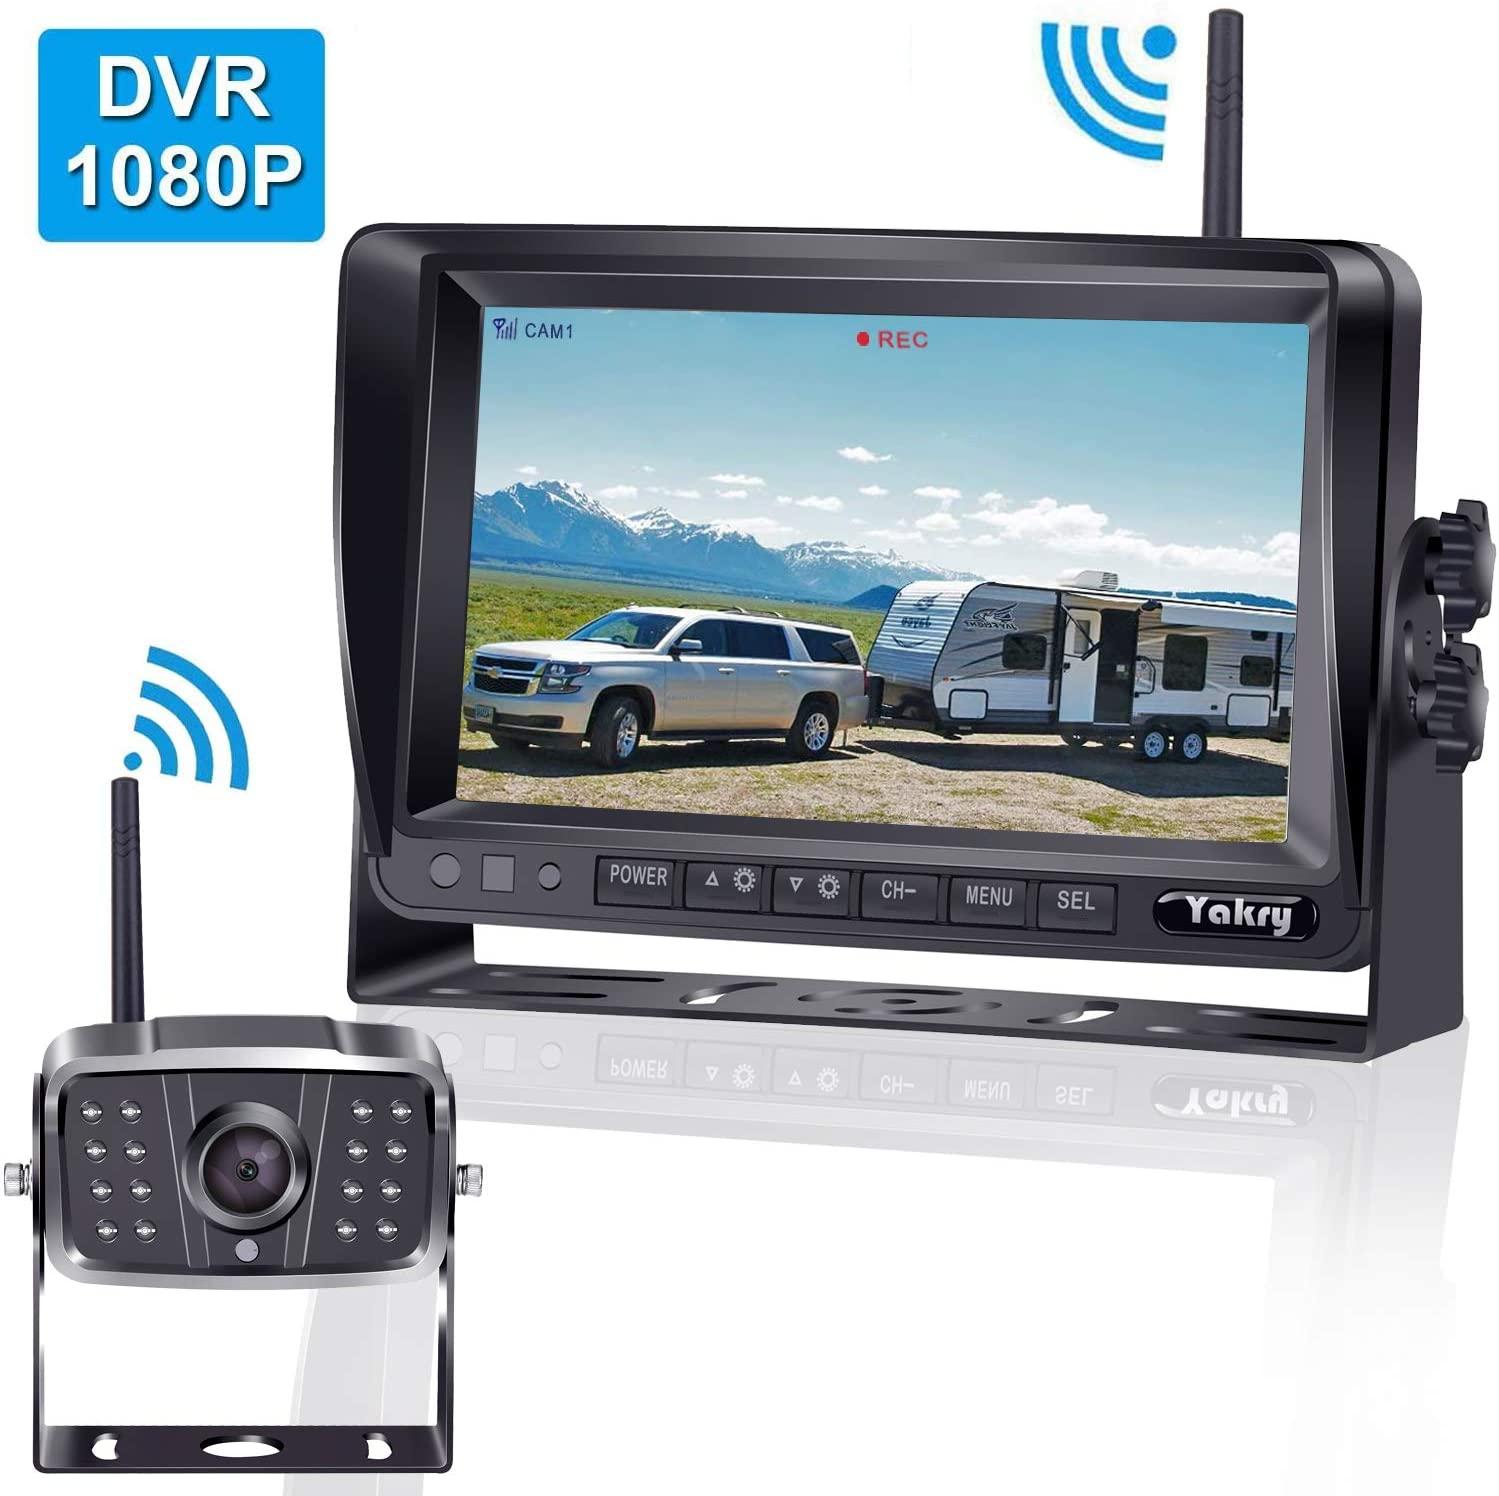 FHD 1080P Digital Wireless Backup Camera